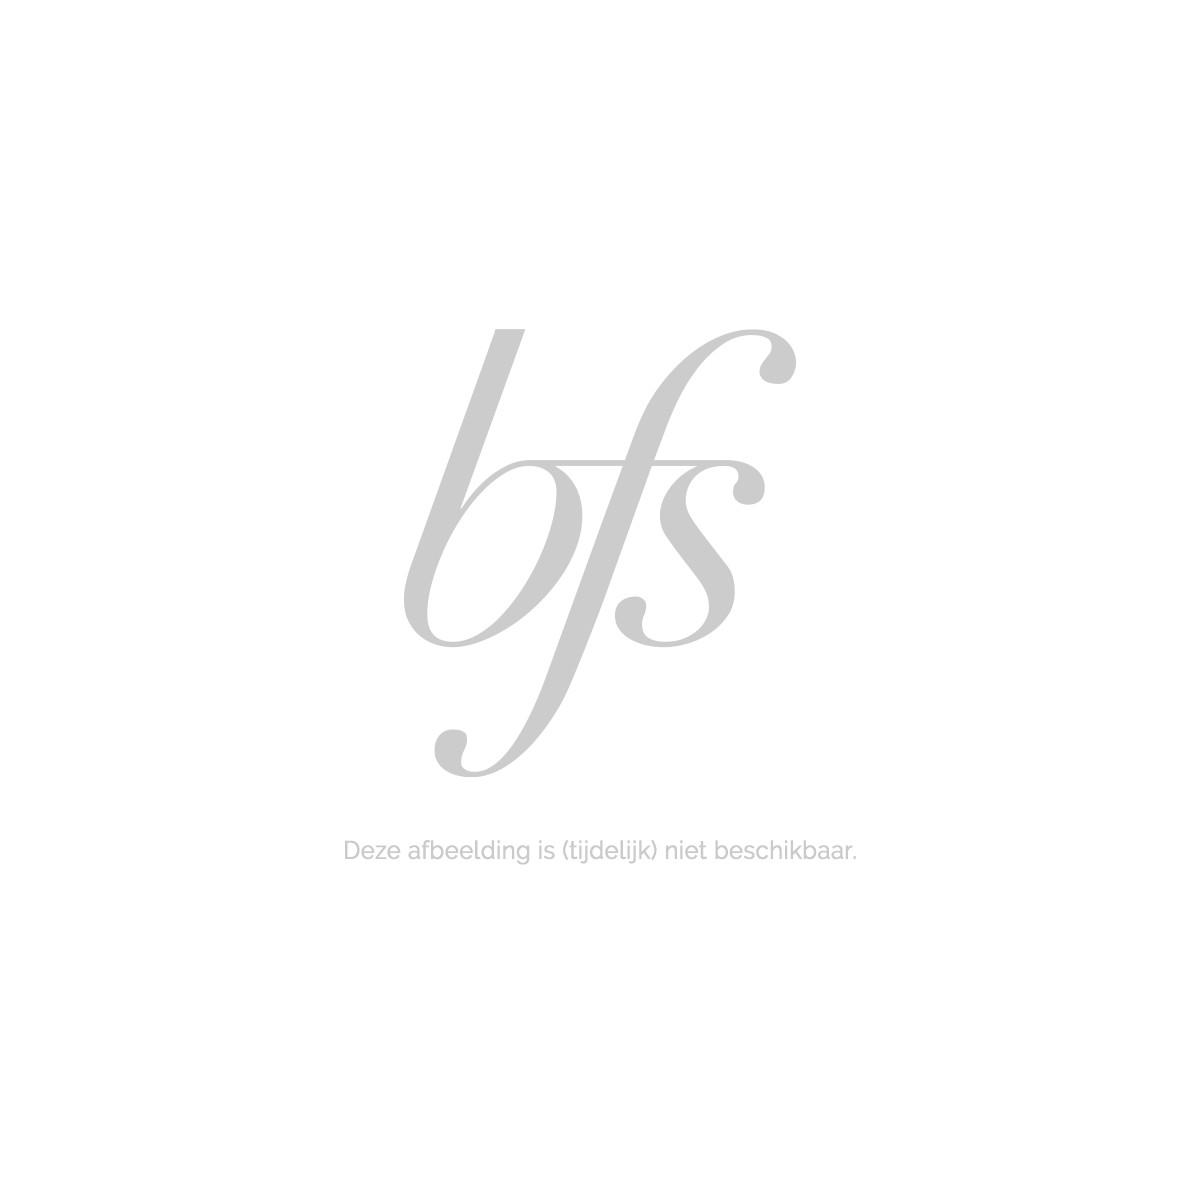 T. LeClerc Hydratant Fluid Foundation 04 Beige Abricot